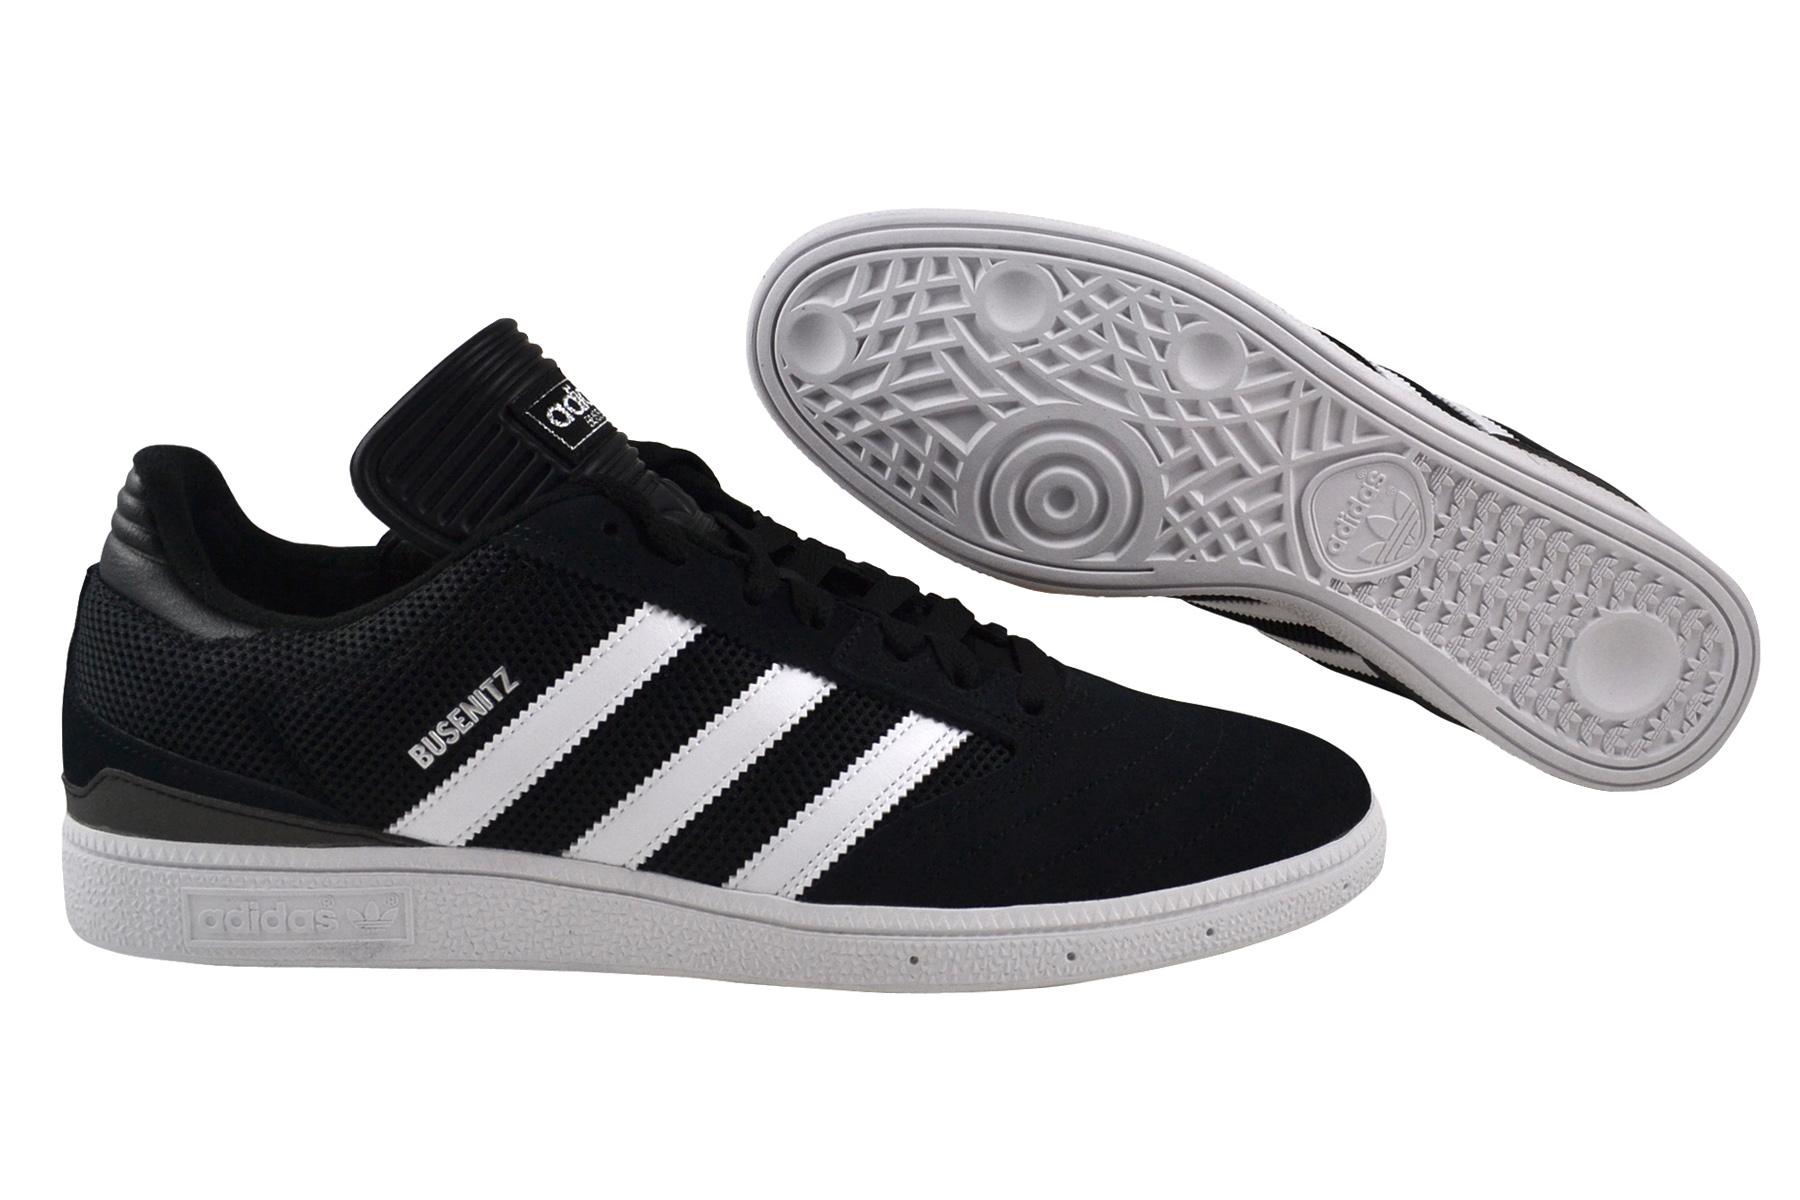 adidas günstig online shop, adidas Busenitz Sneaker, F37347